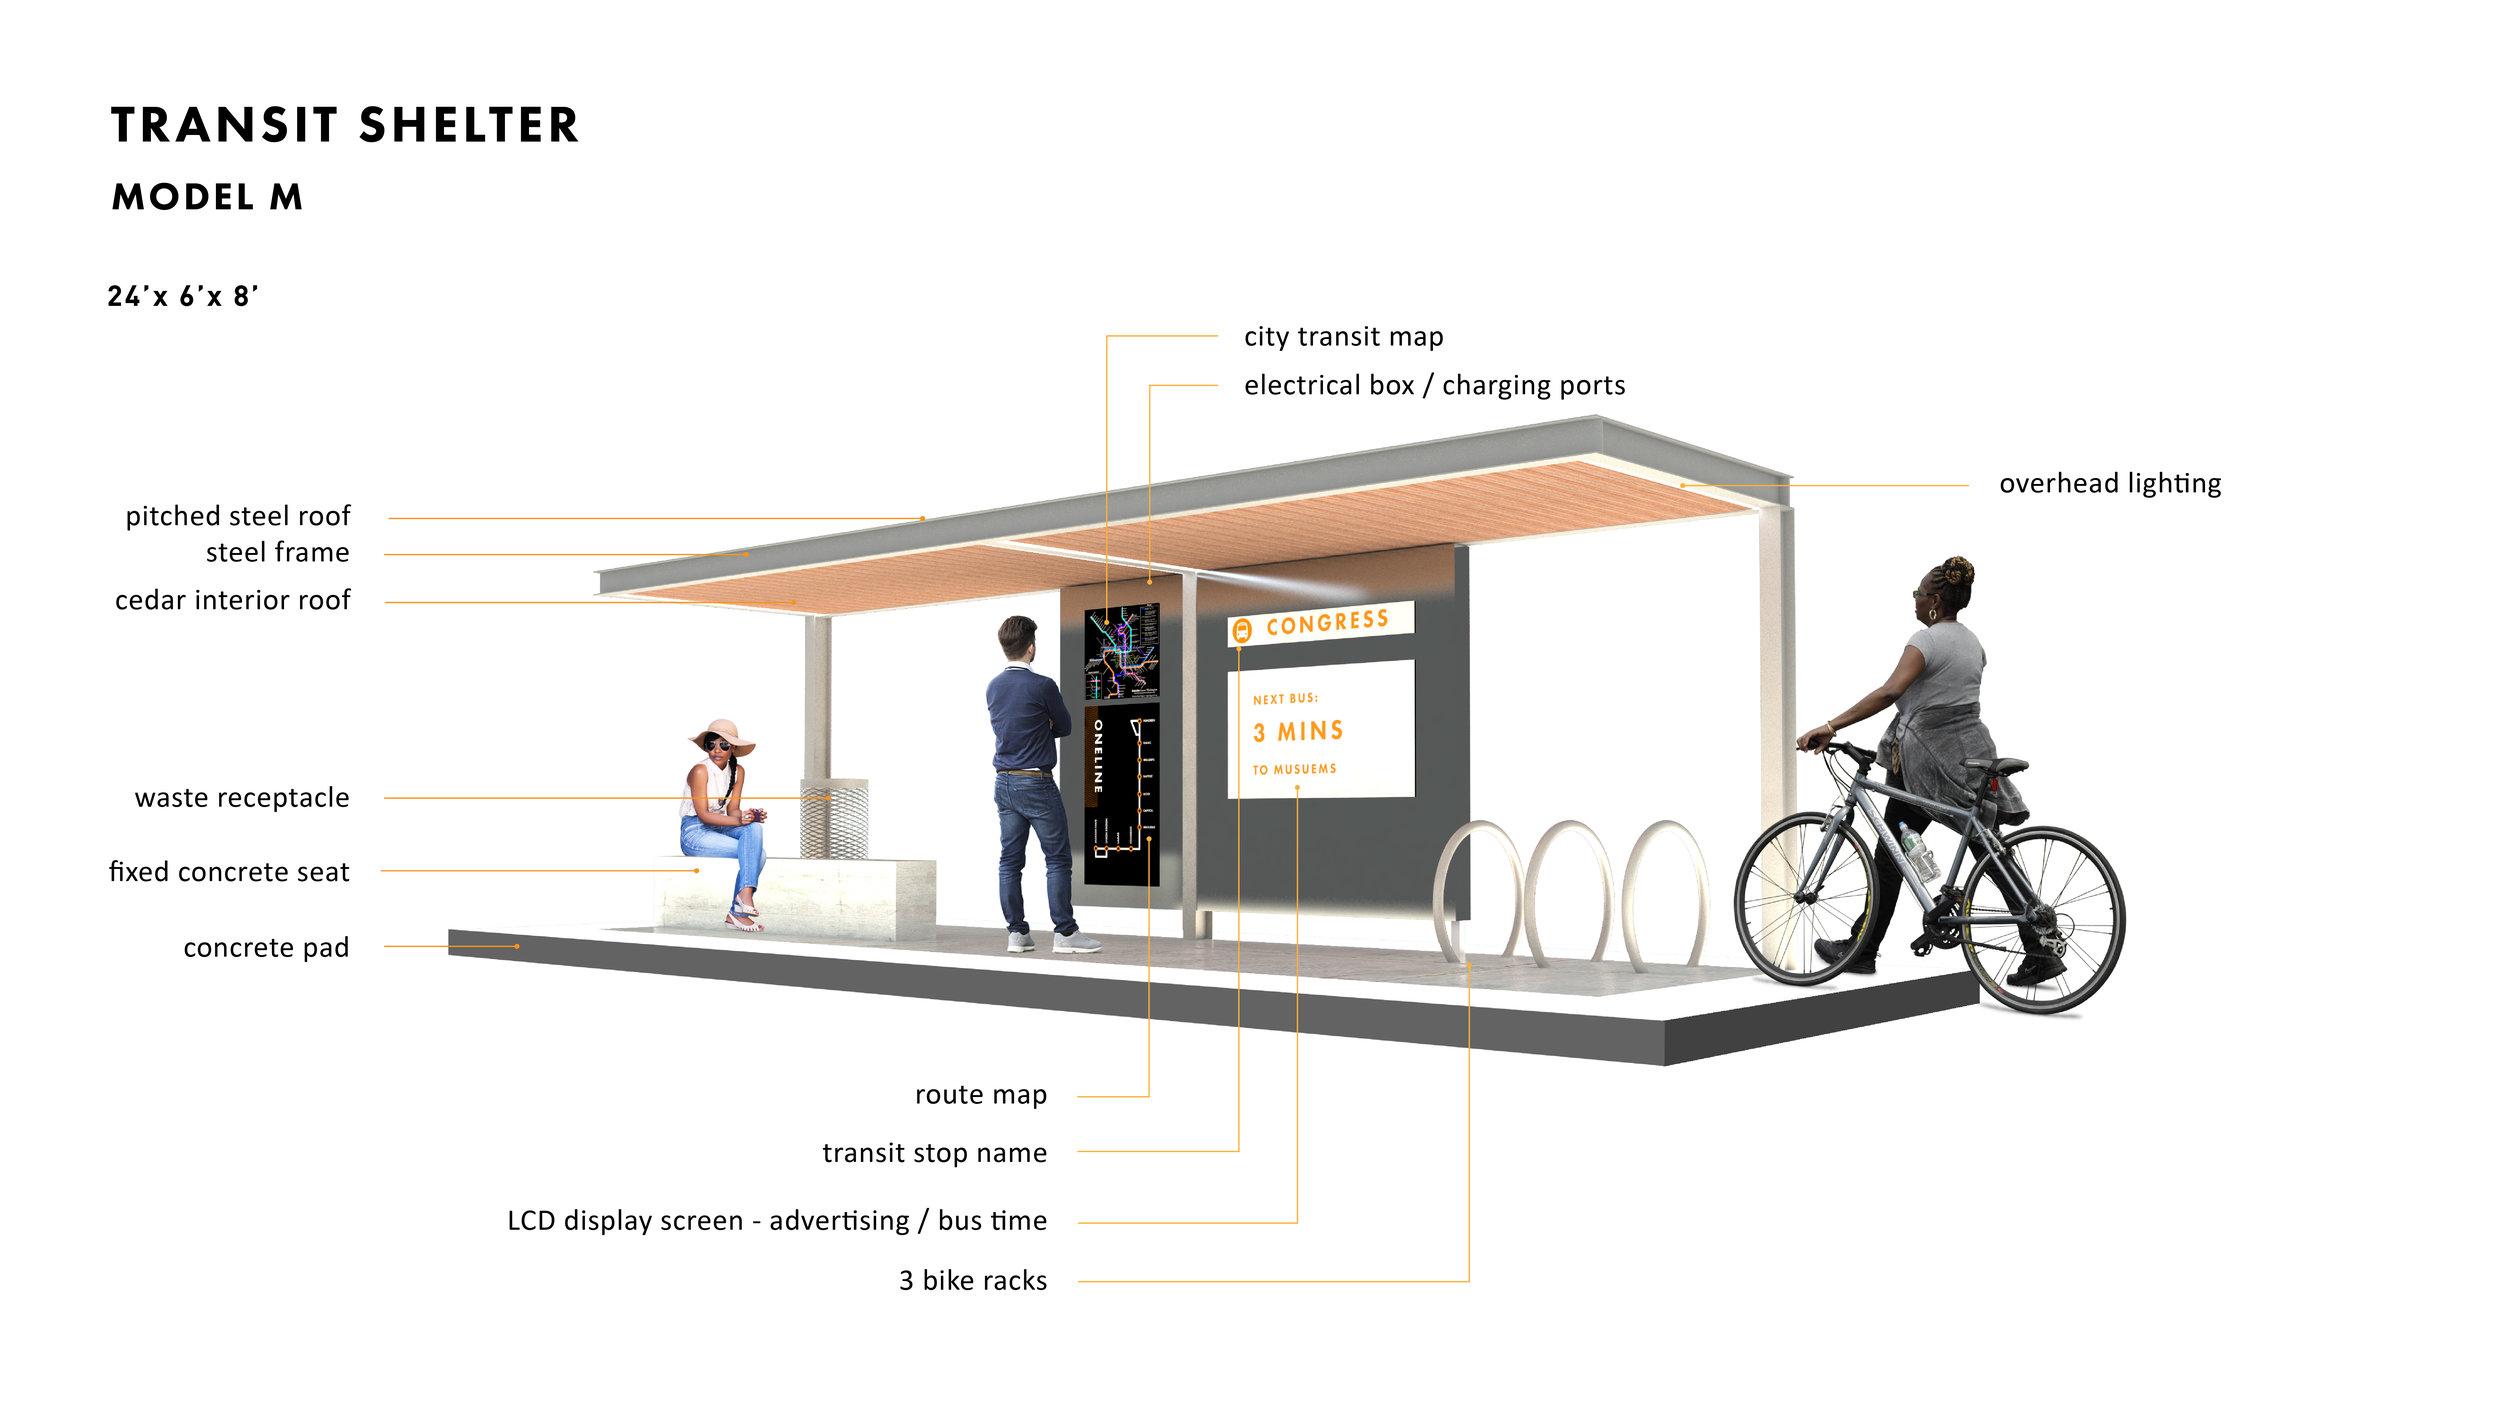 Re-imaging Transit! - City of Jackson conceptual transit shelter design